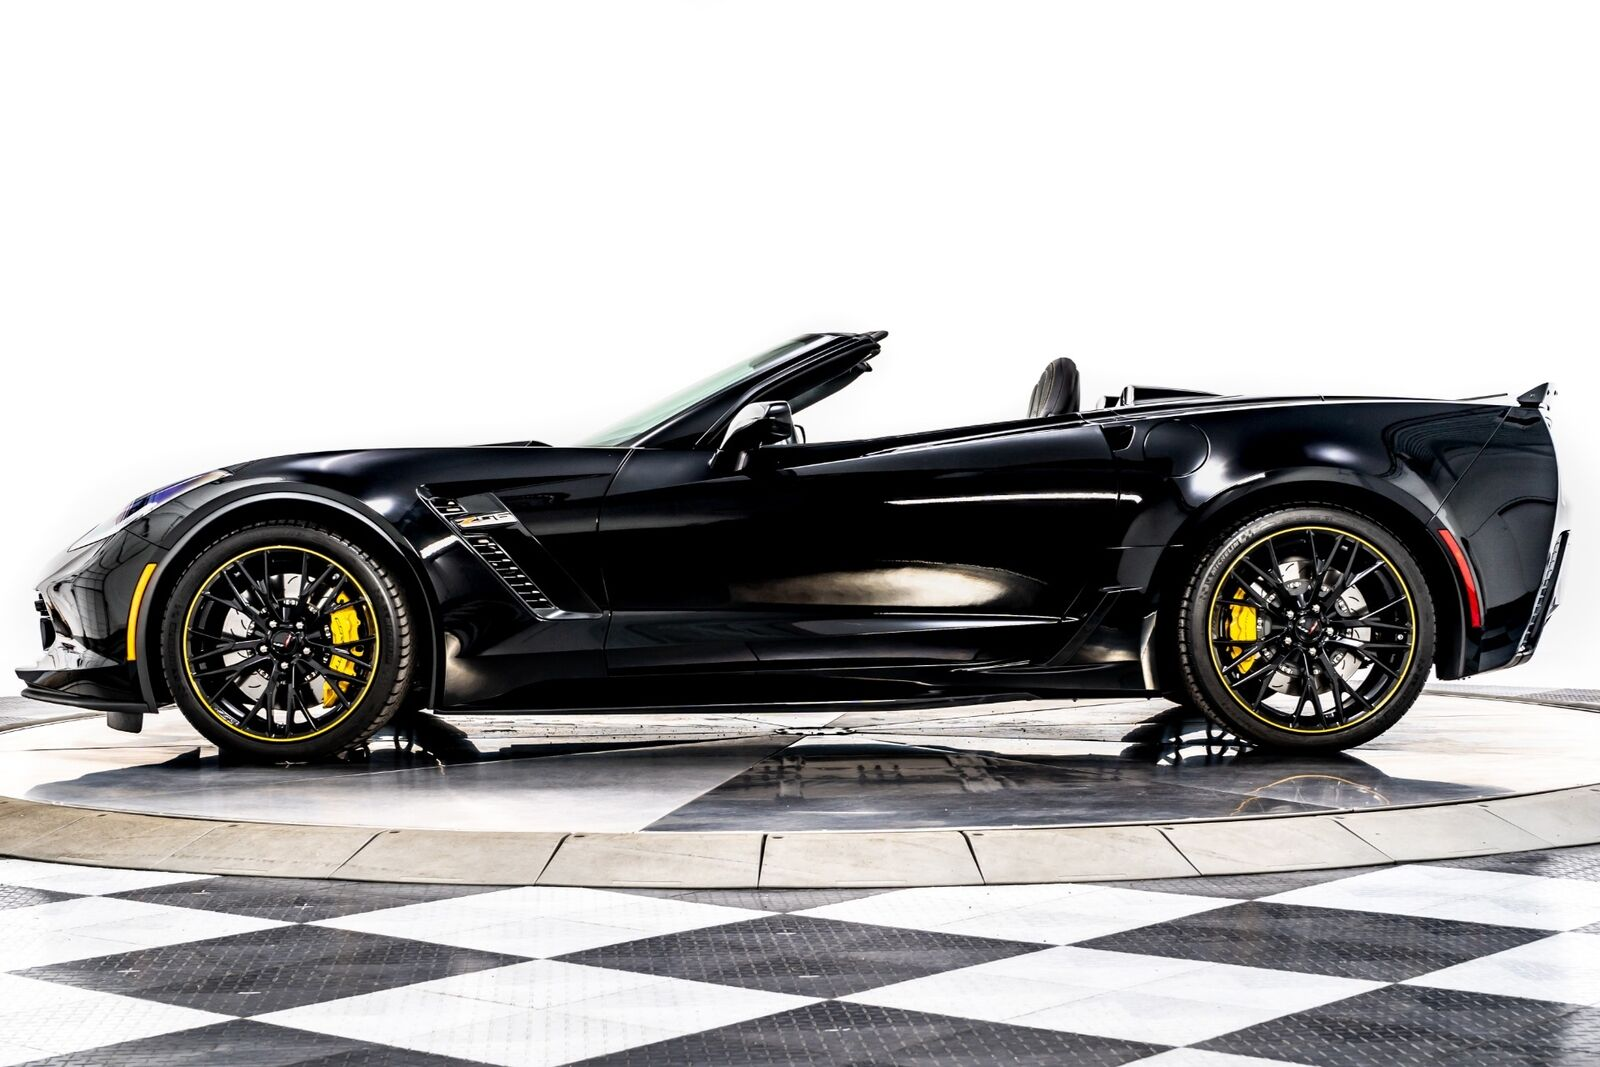 2018 Black Chevrolet Corvette Z06 3LZ   C7 Corvette Photo 5